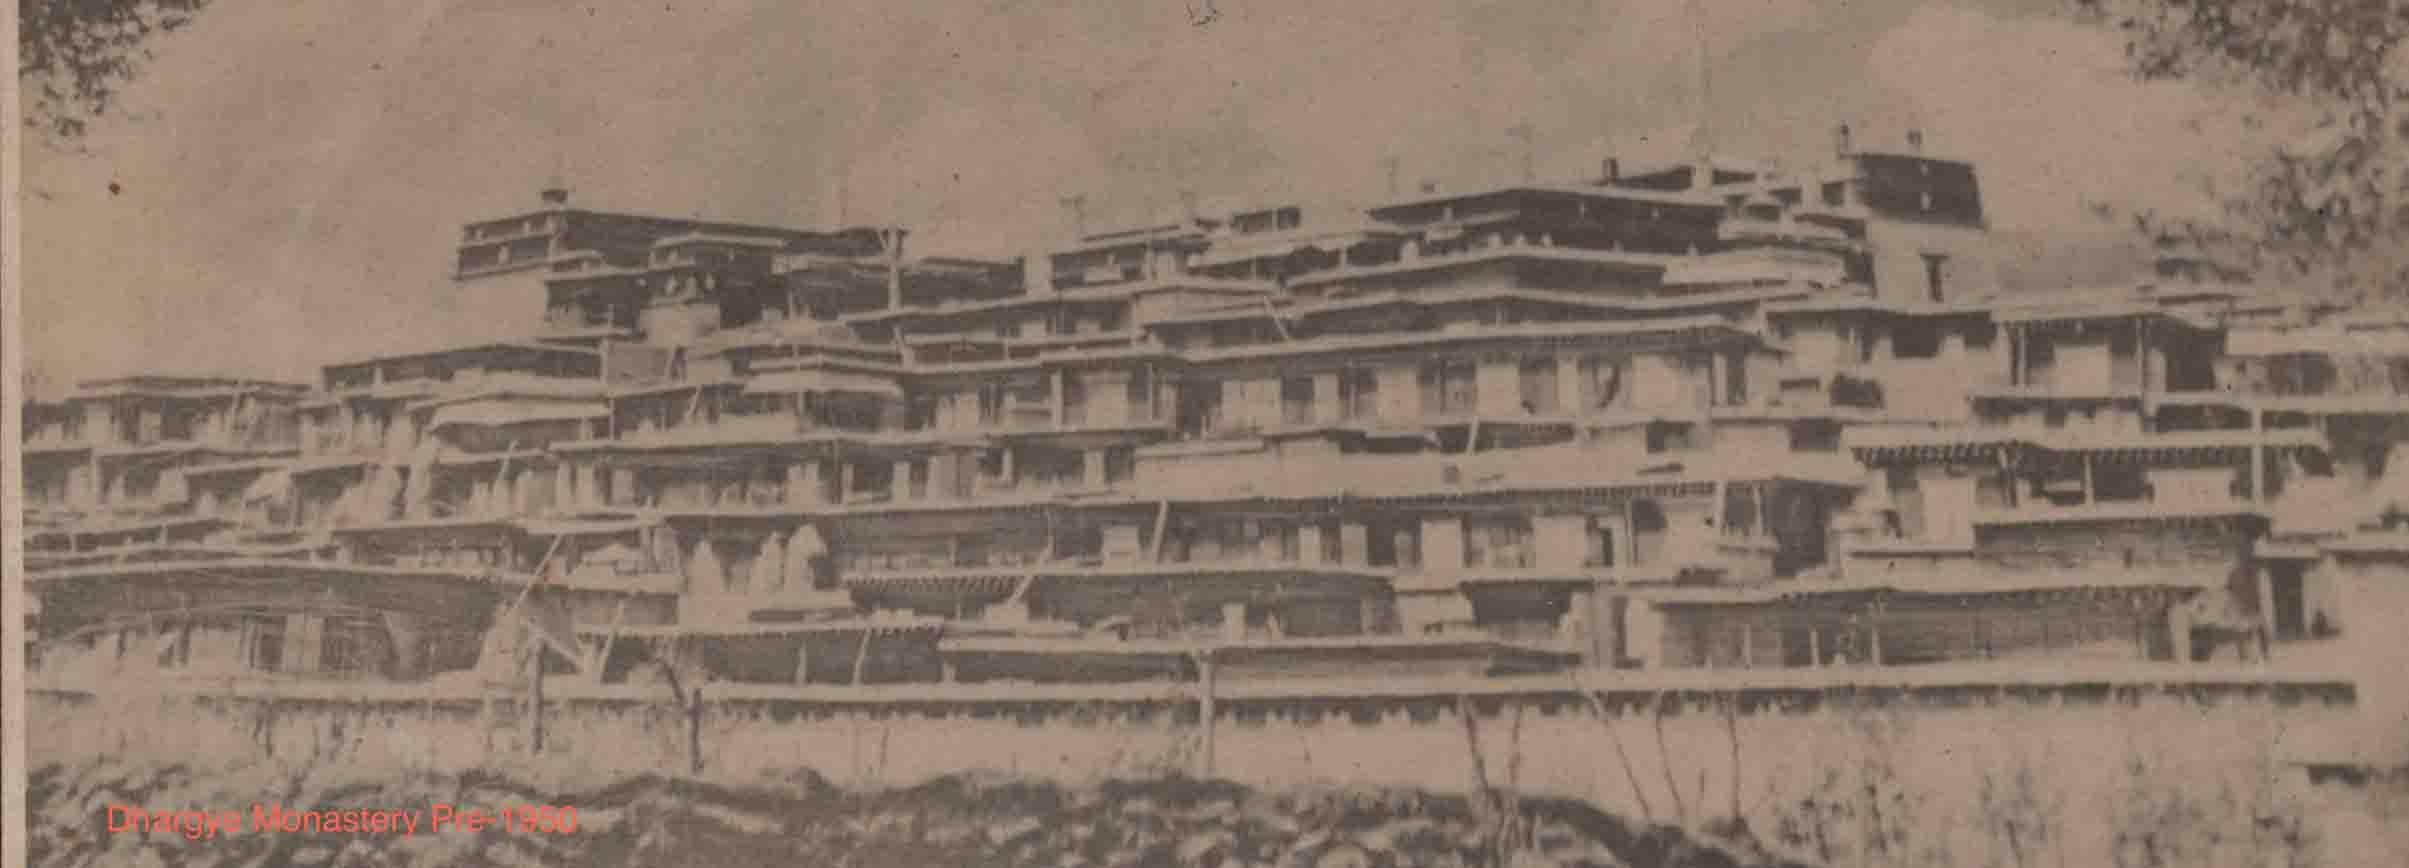 Dhargye Monastery (Pre-1950)